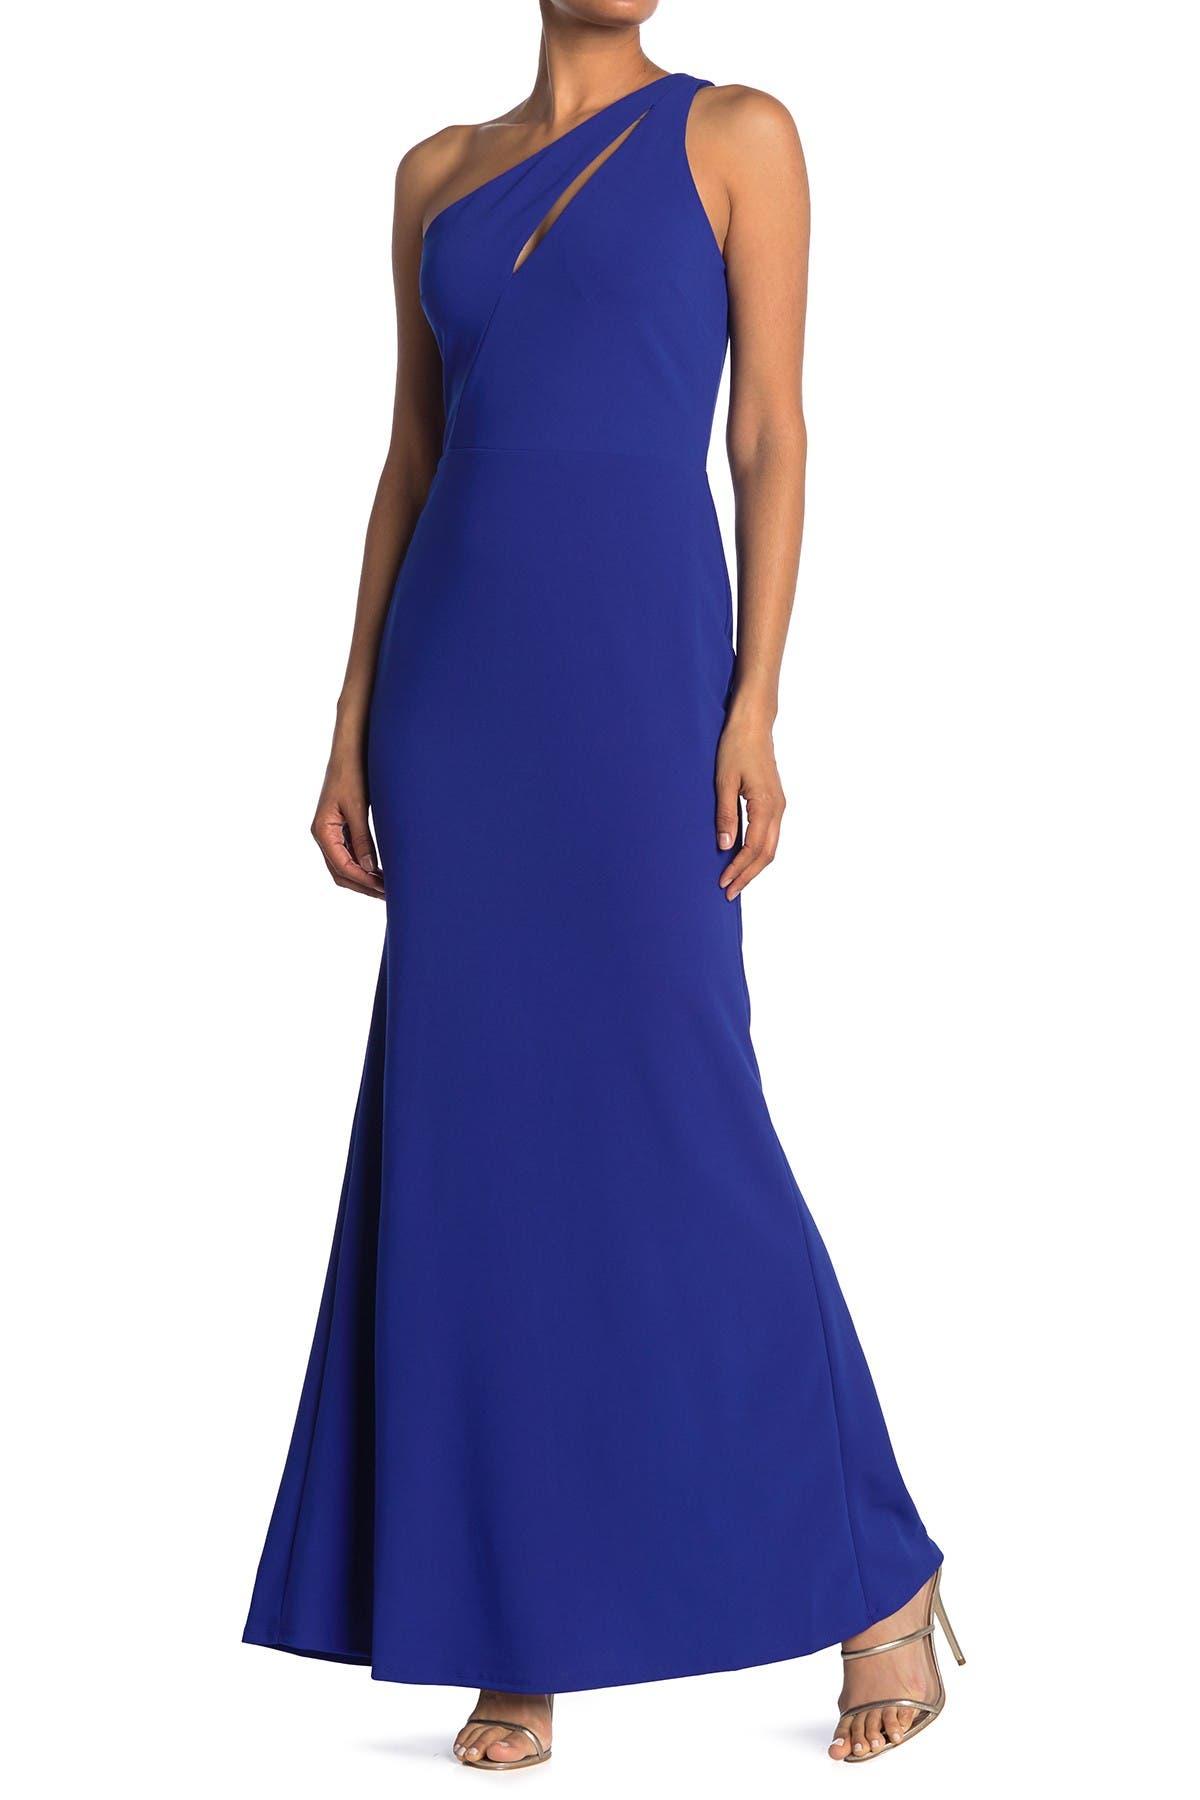 Image of bebe Scuba Crepe Cutout One Shoulder Dress